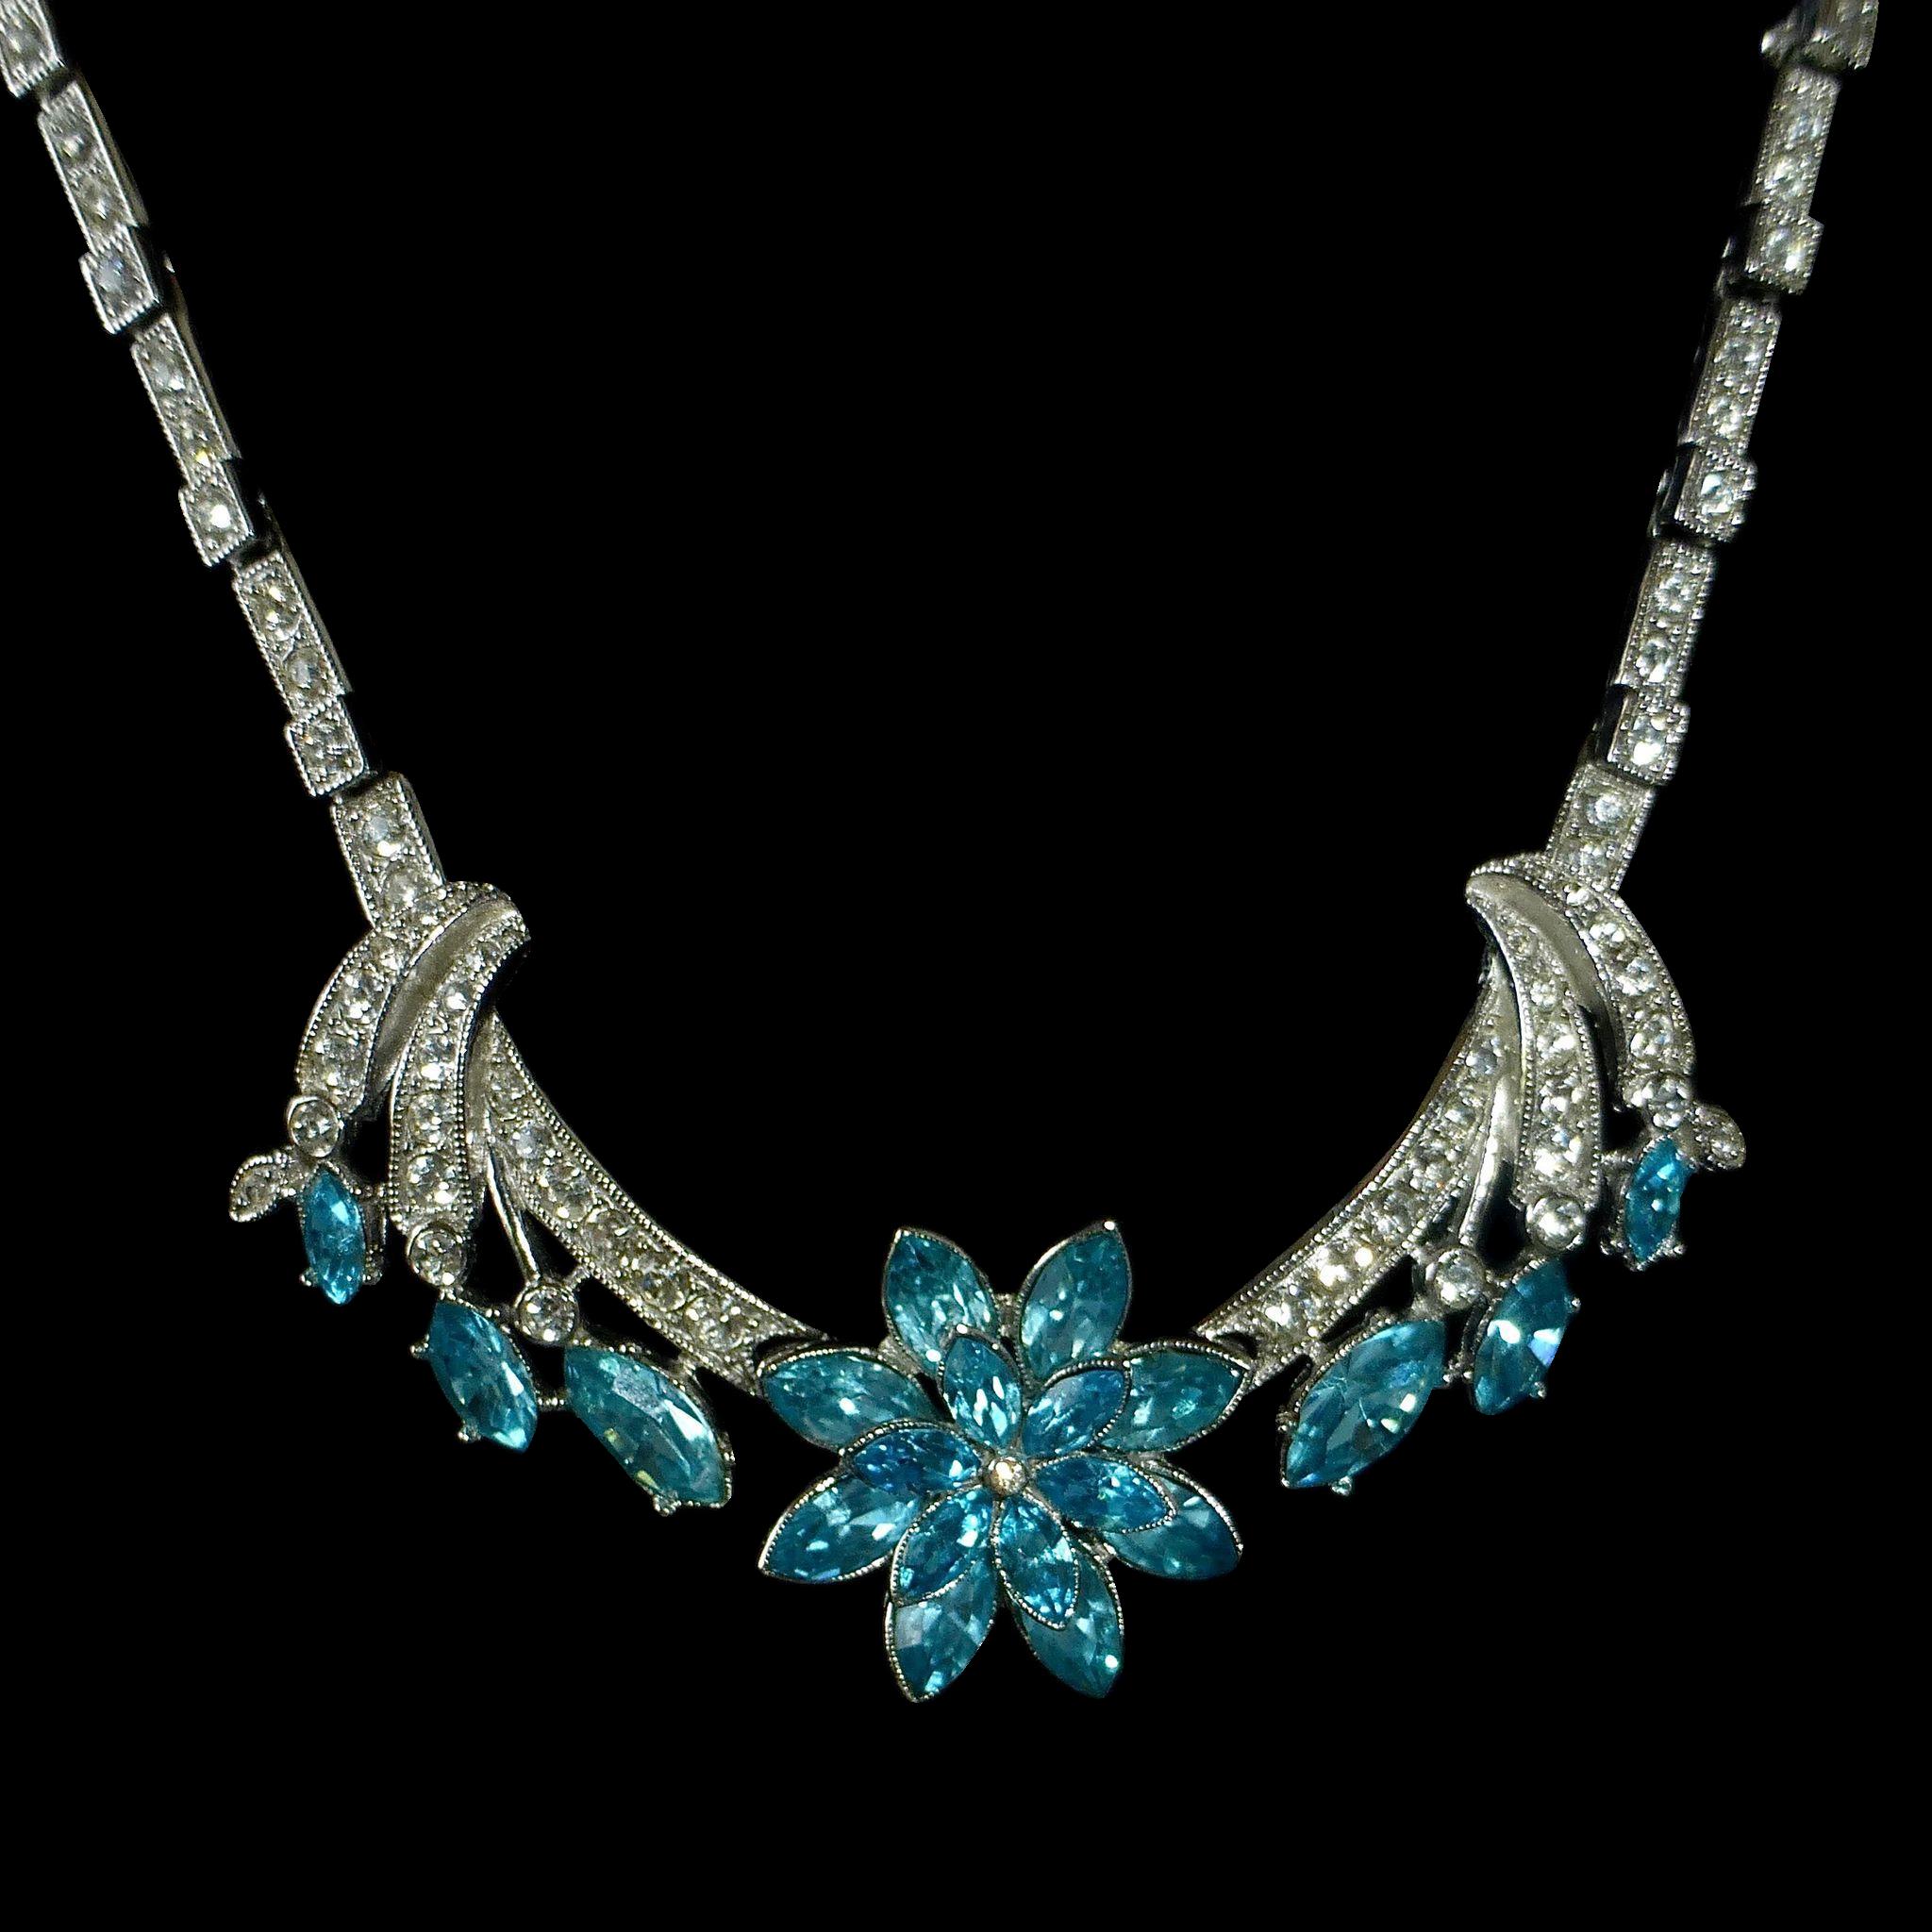 Ora Rhodium Plated Rhinestone Necklace w Aqua Floral Centerpiece